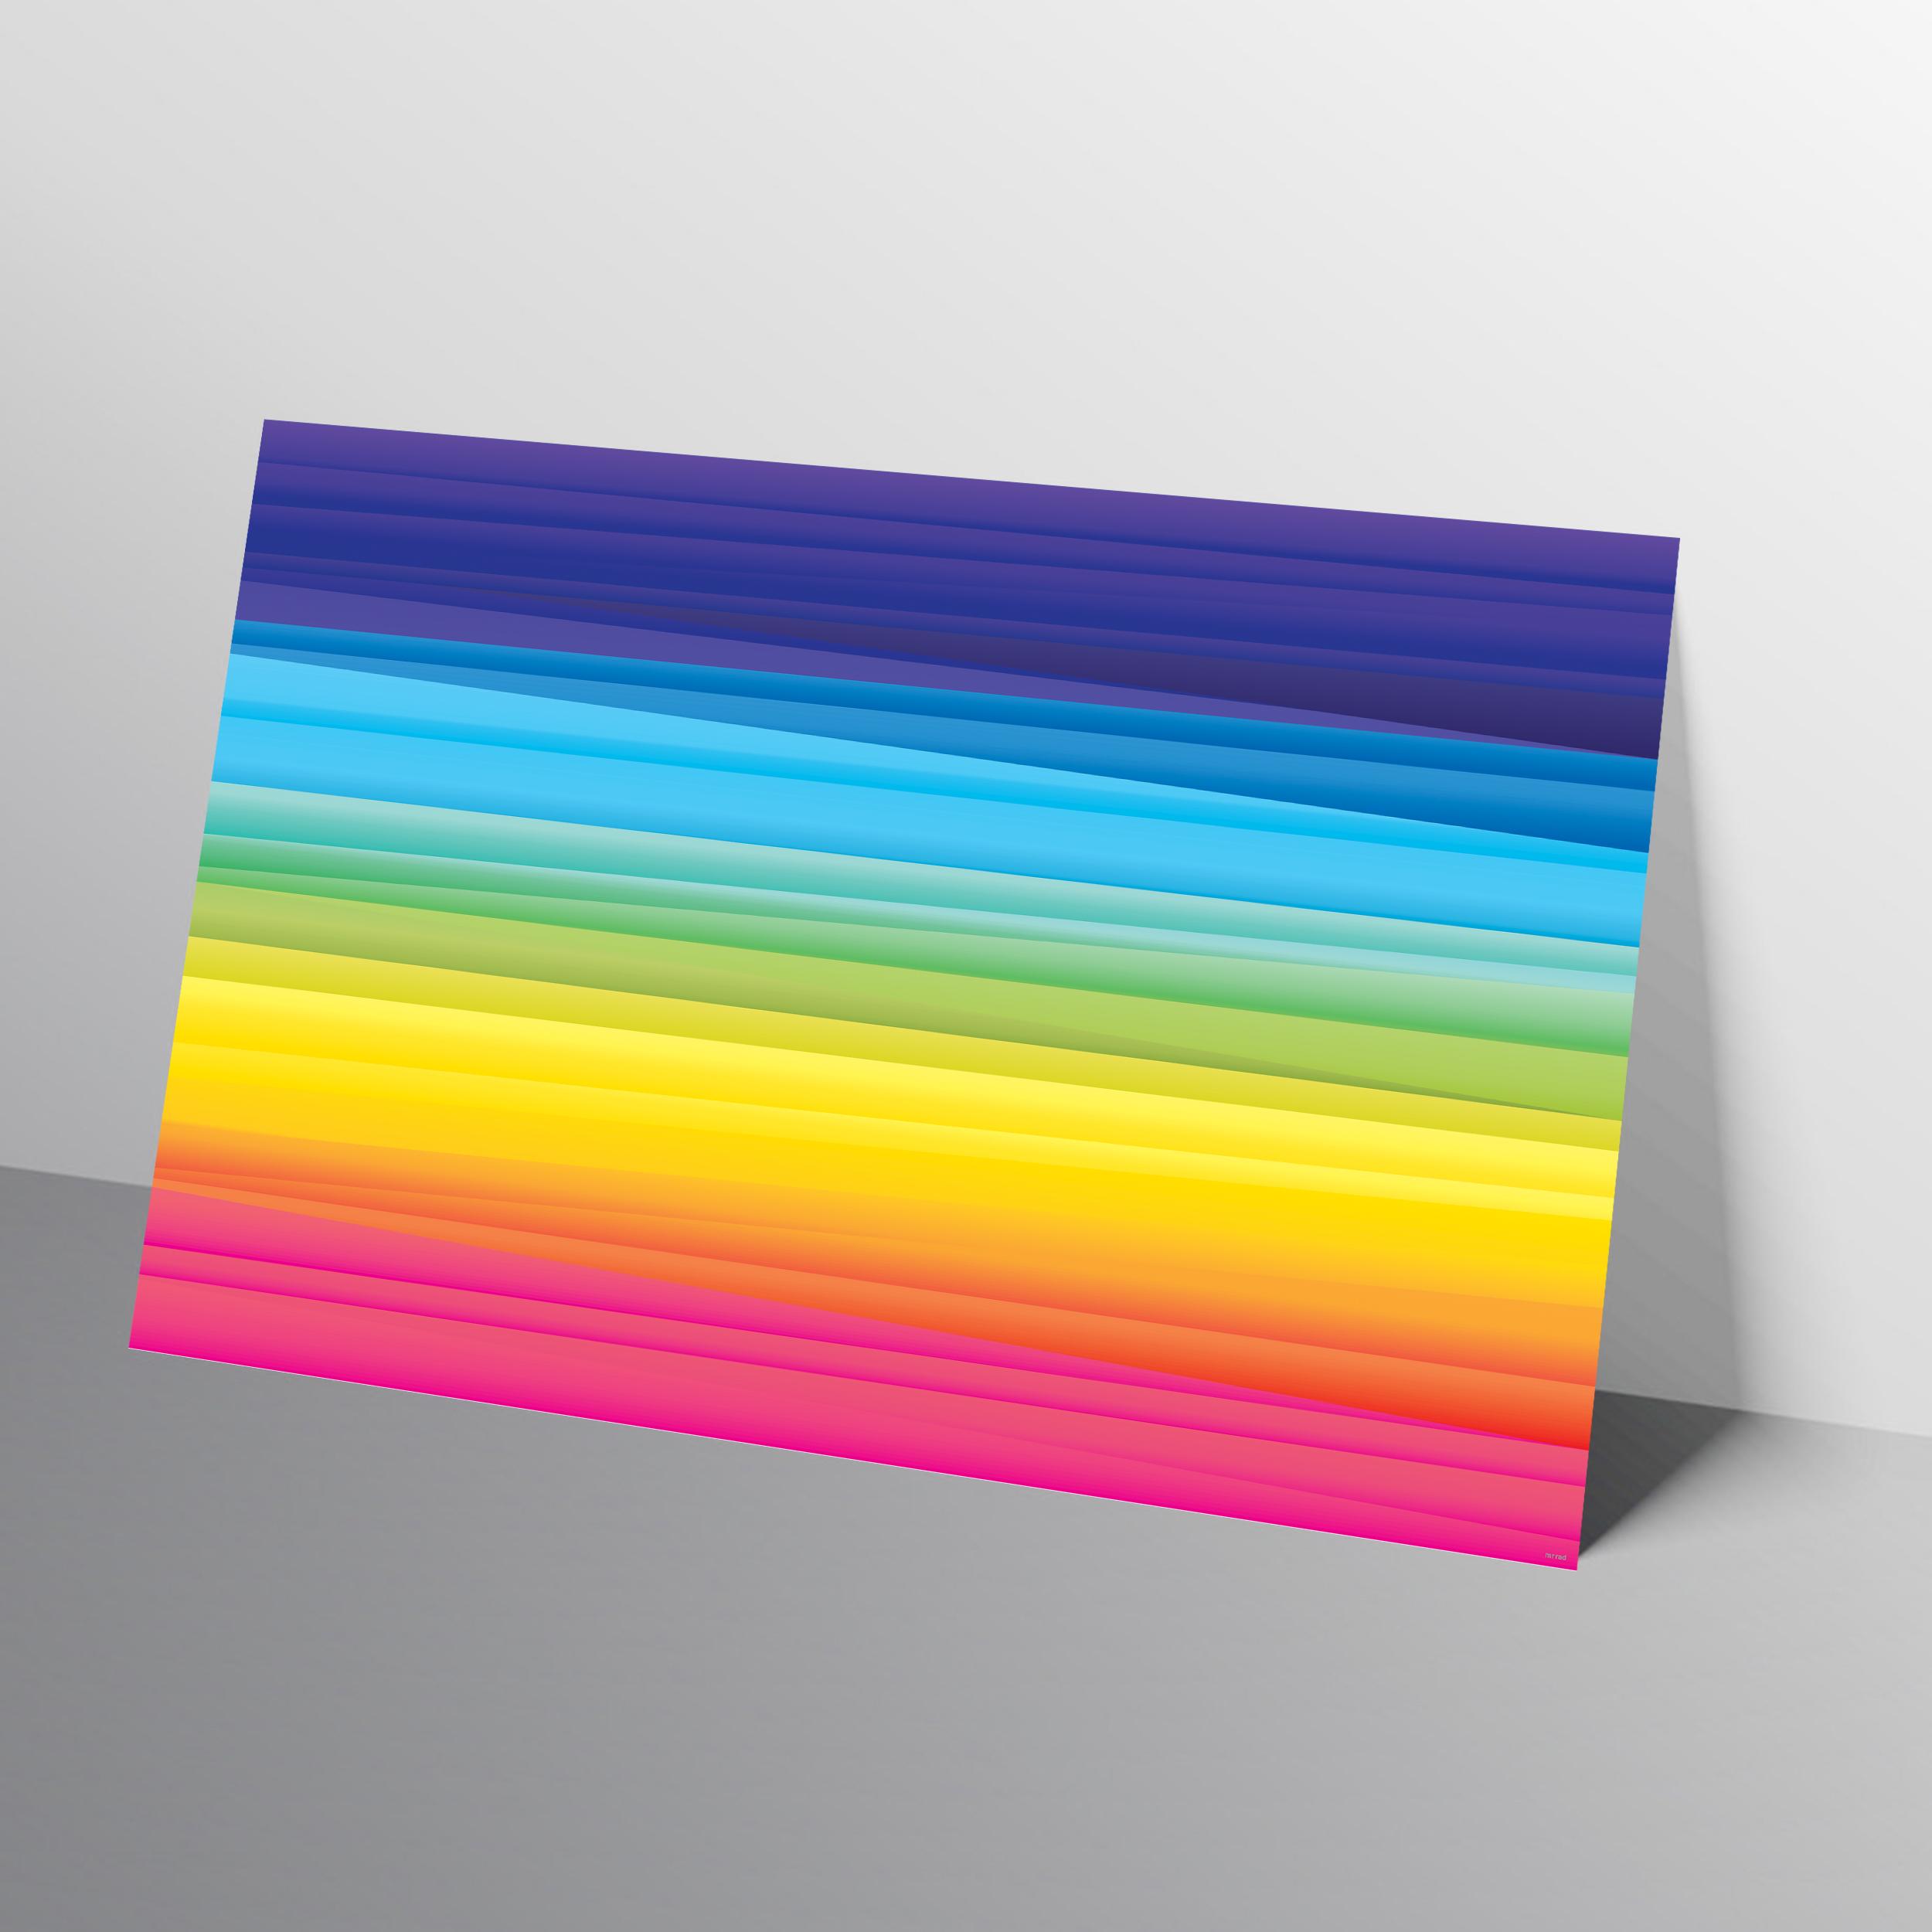 کاغذ رنگی A4 مستر راد مدل رنگارنگ بسته 10 عددی main 1 14